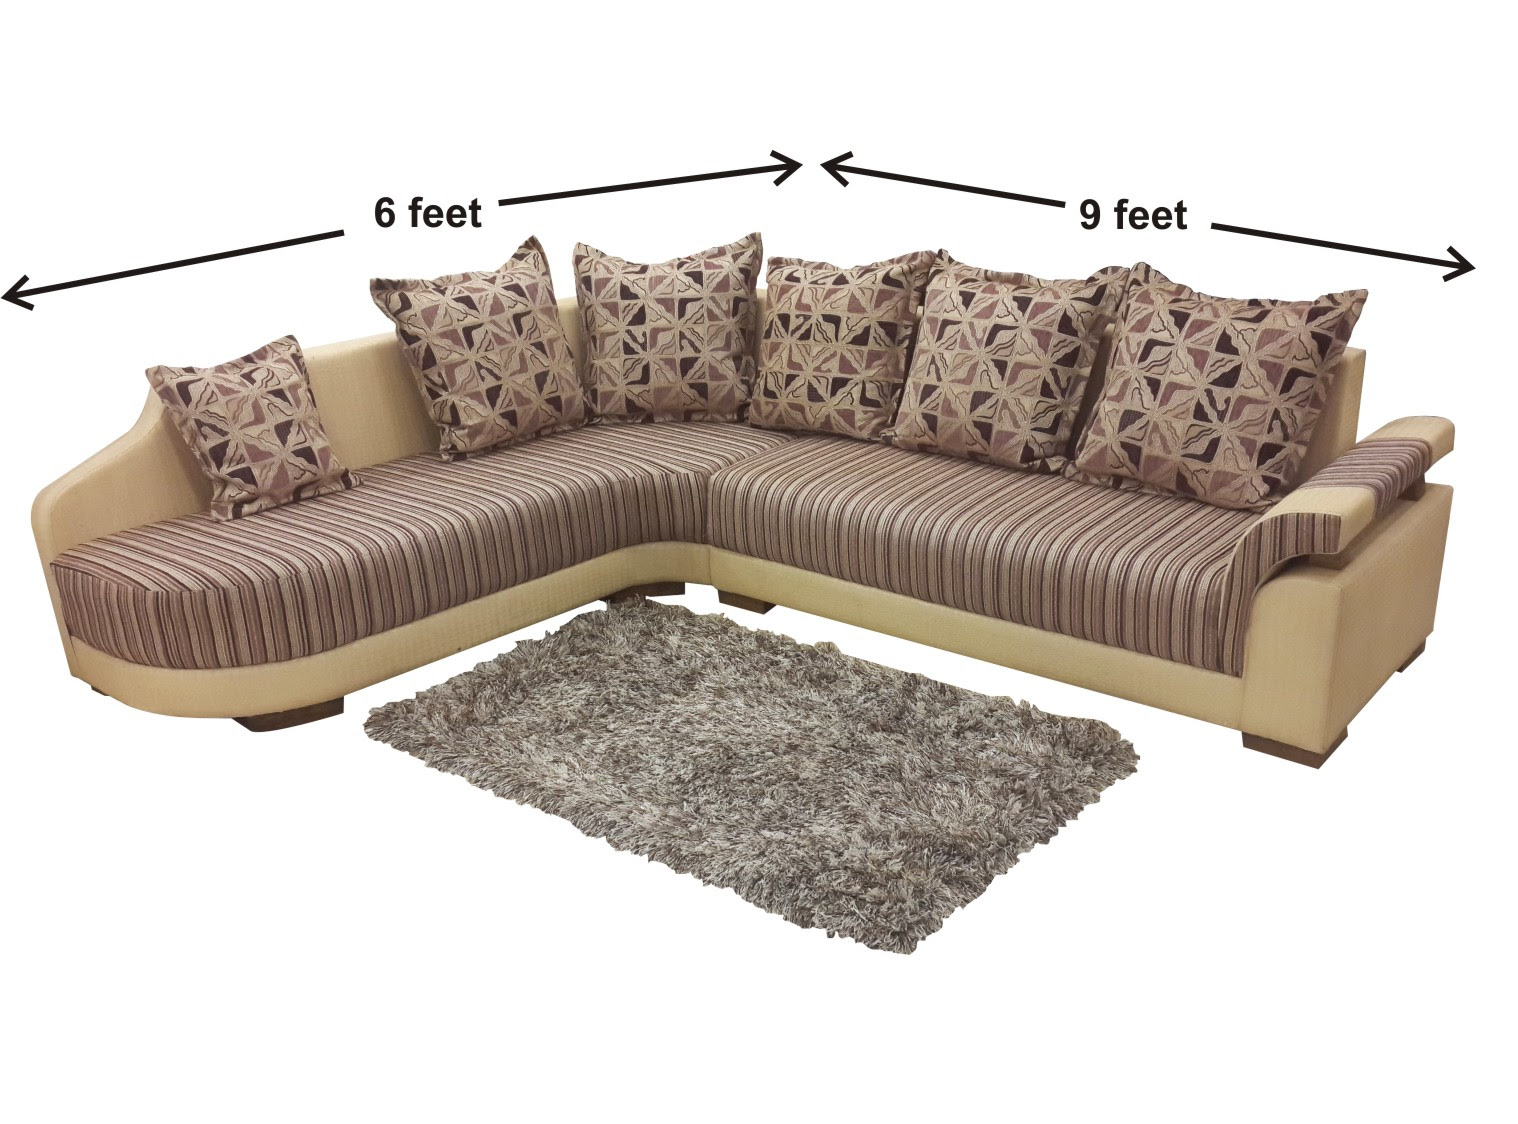 Buy Left Side Langer L Shaped Sofa from OnlineSofaDesign